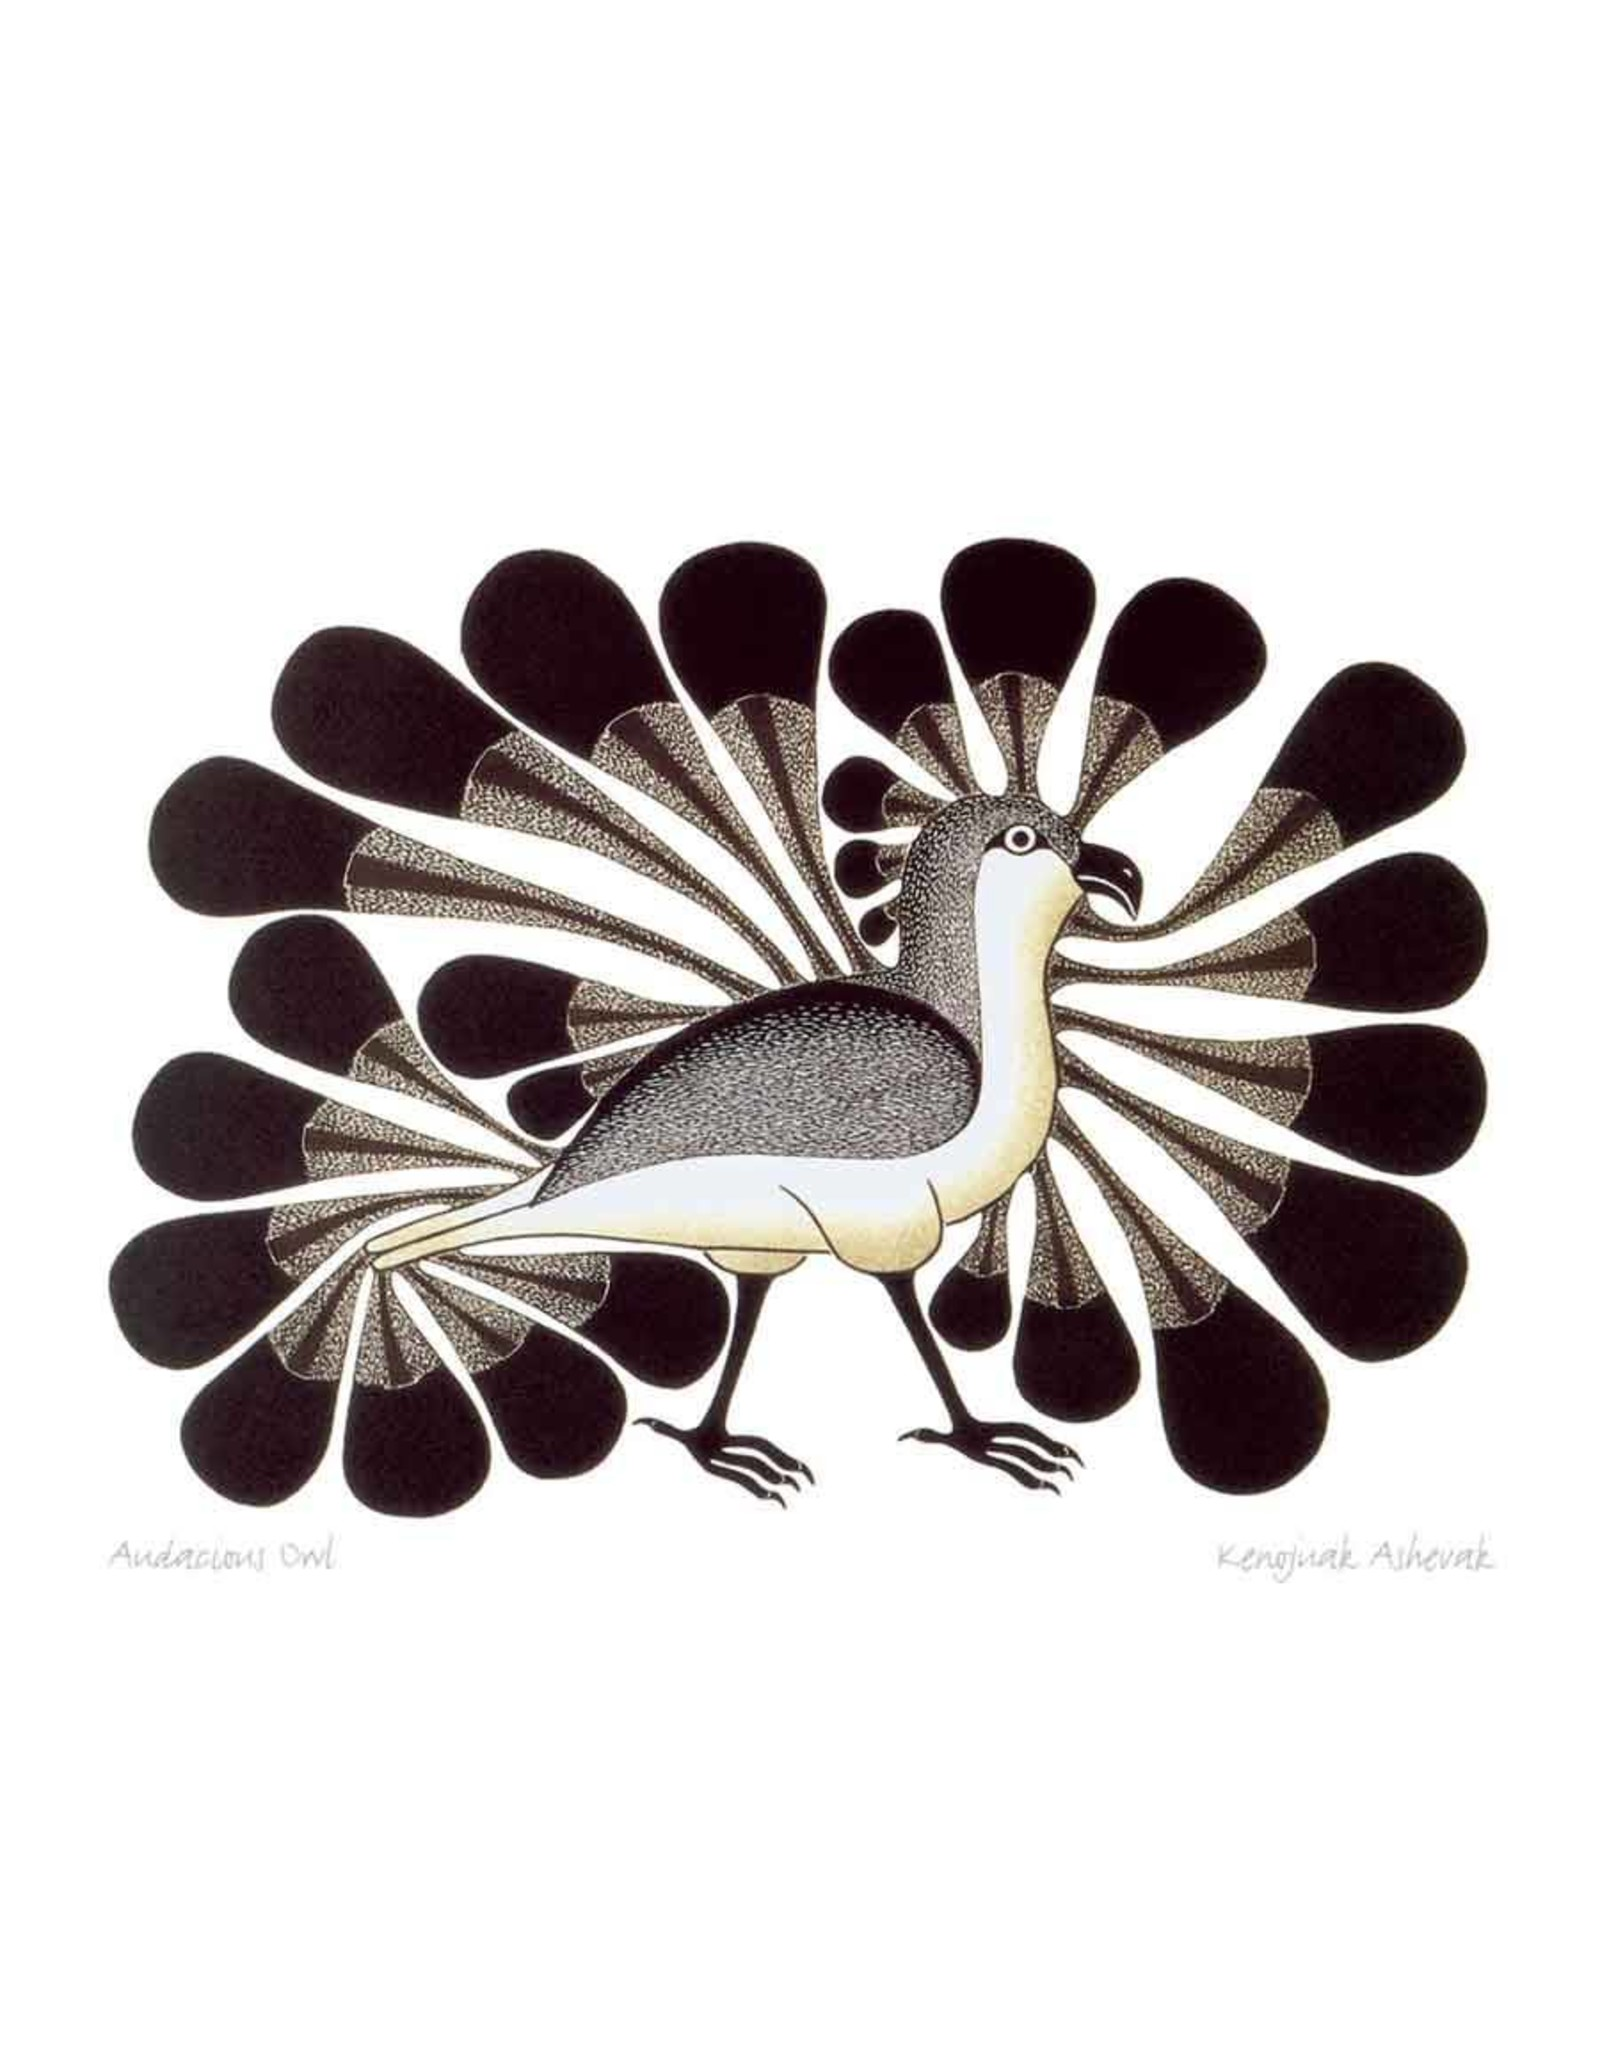 Audacious Owl by Kenojuak Ashevak Card